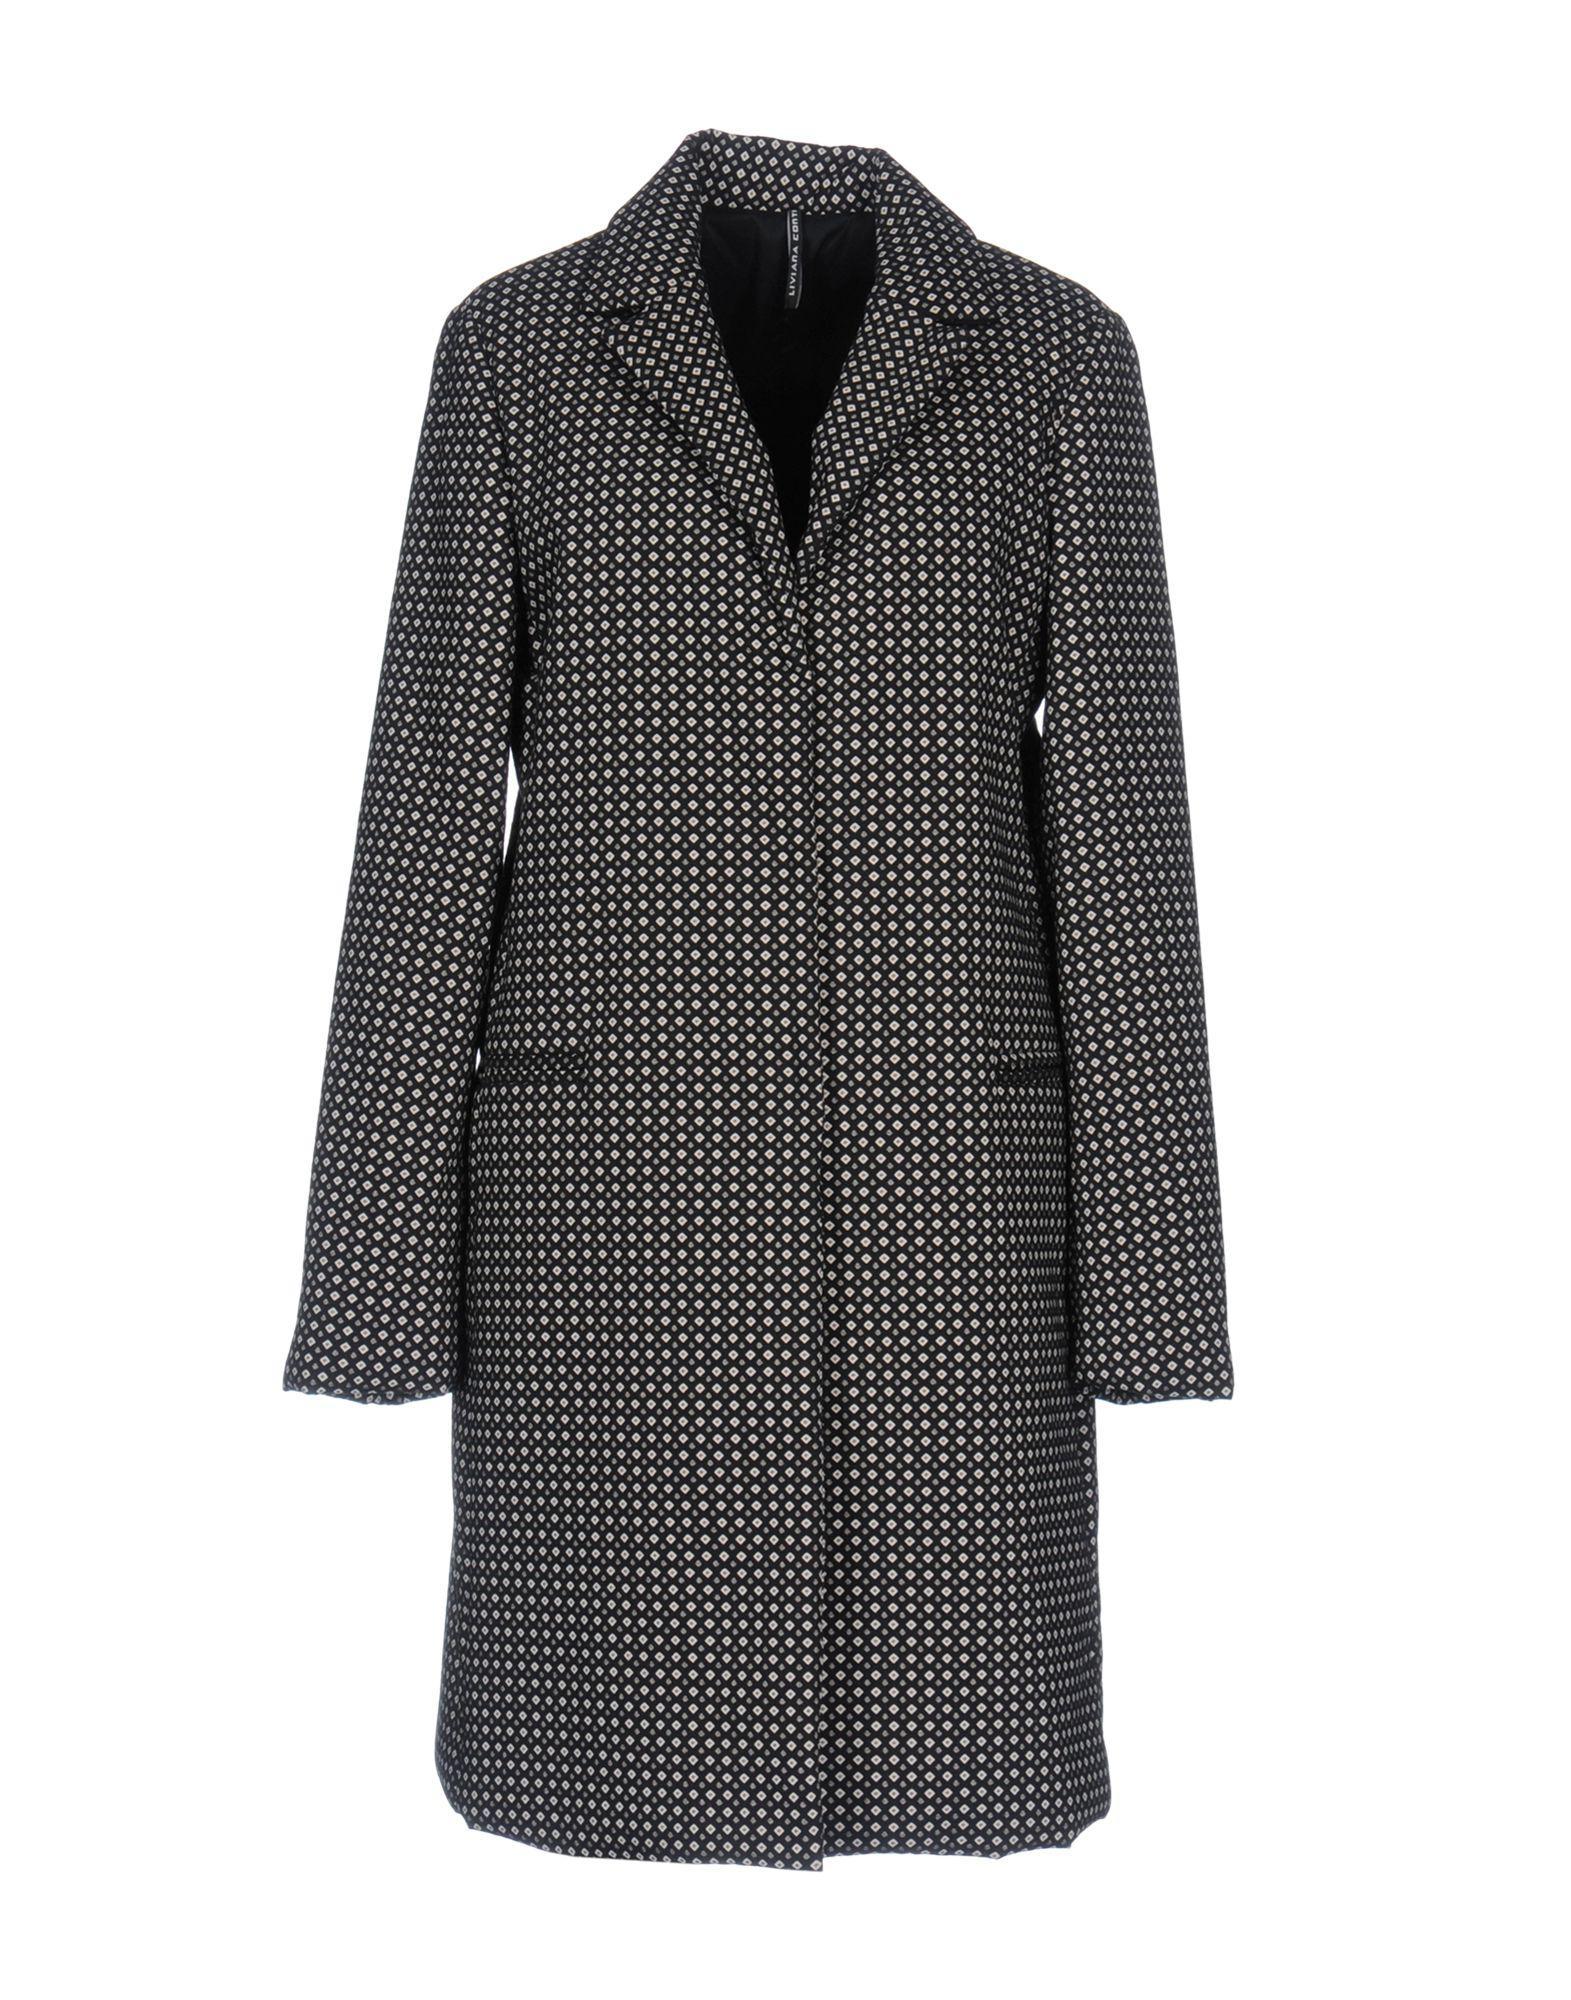 Liviana Conti Coat In Black